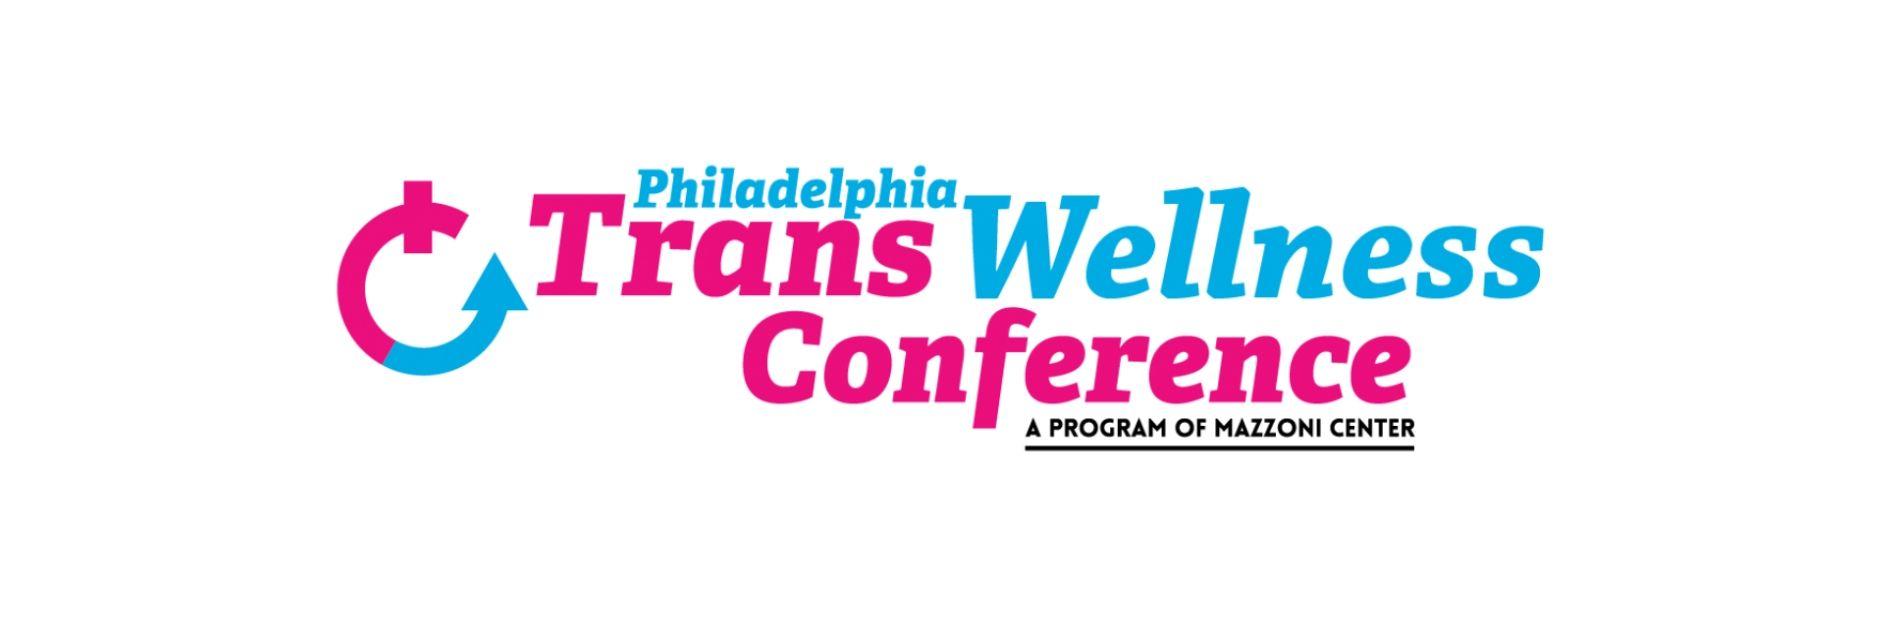 2019 transhealth conference